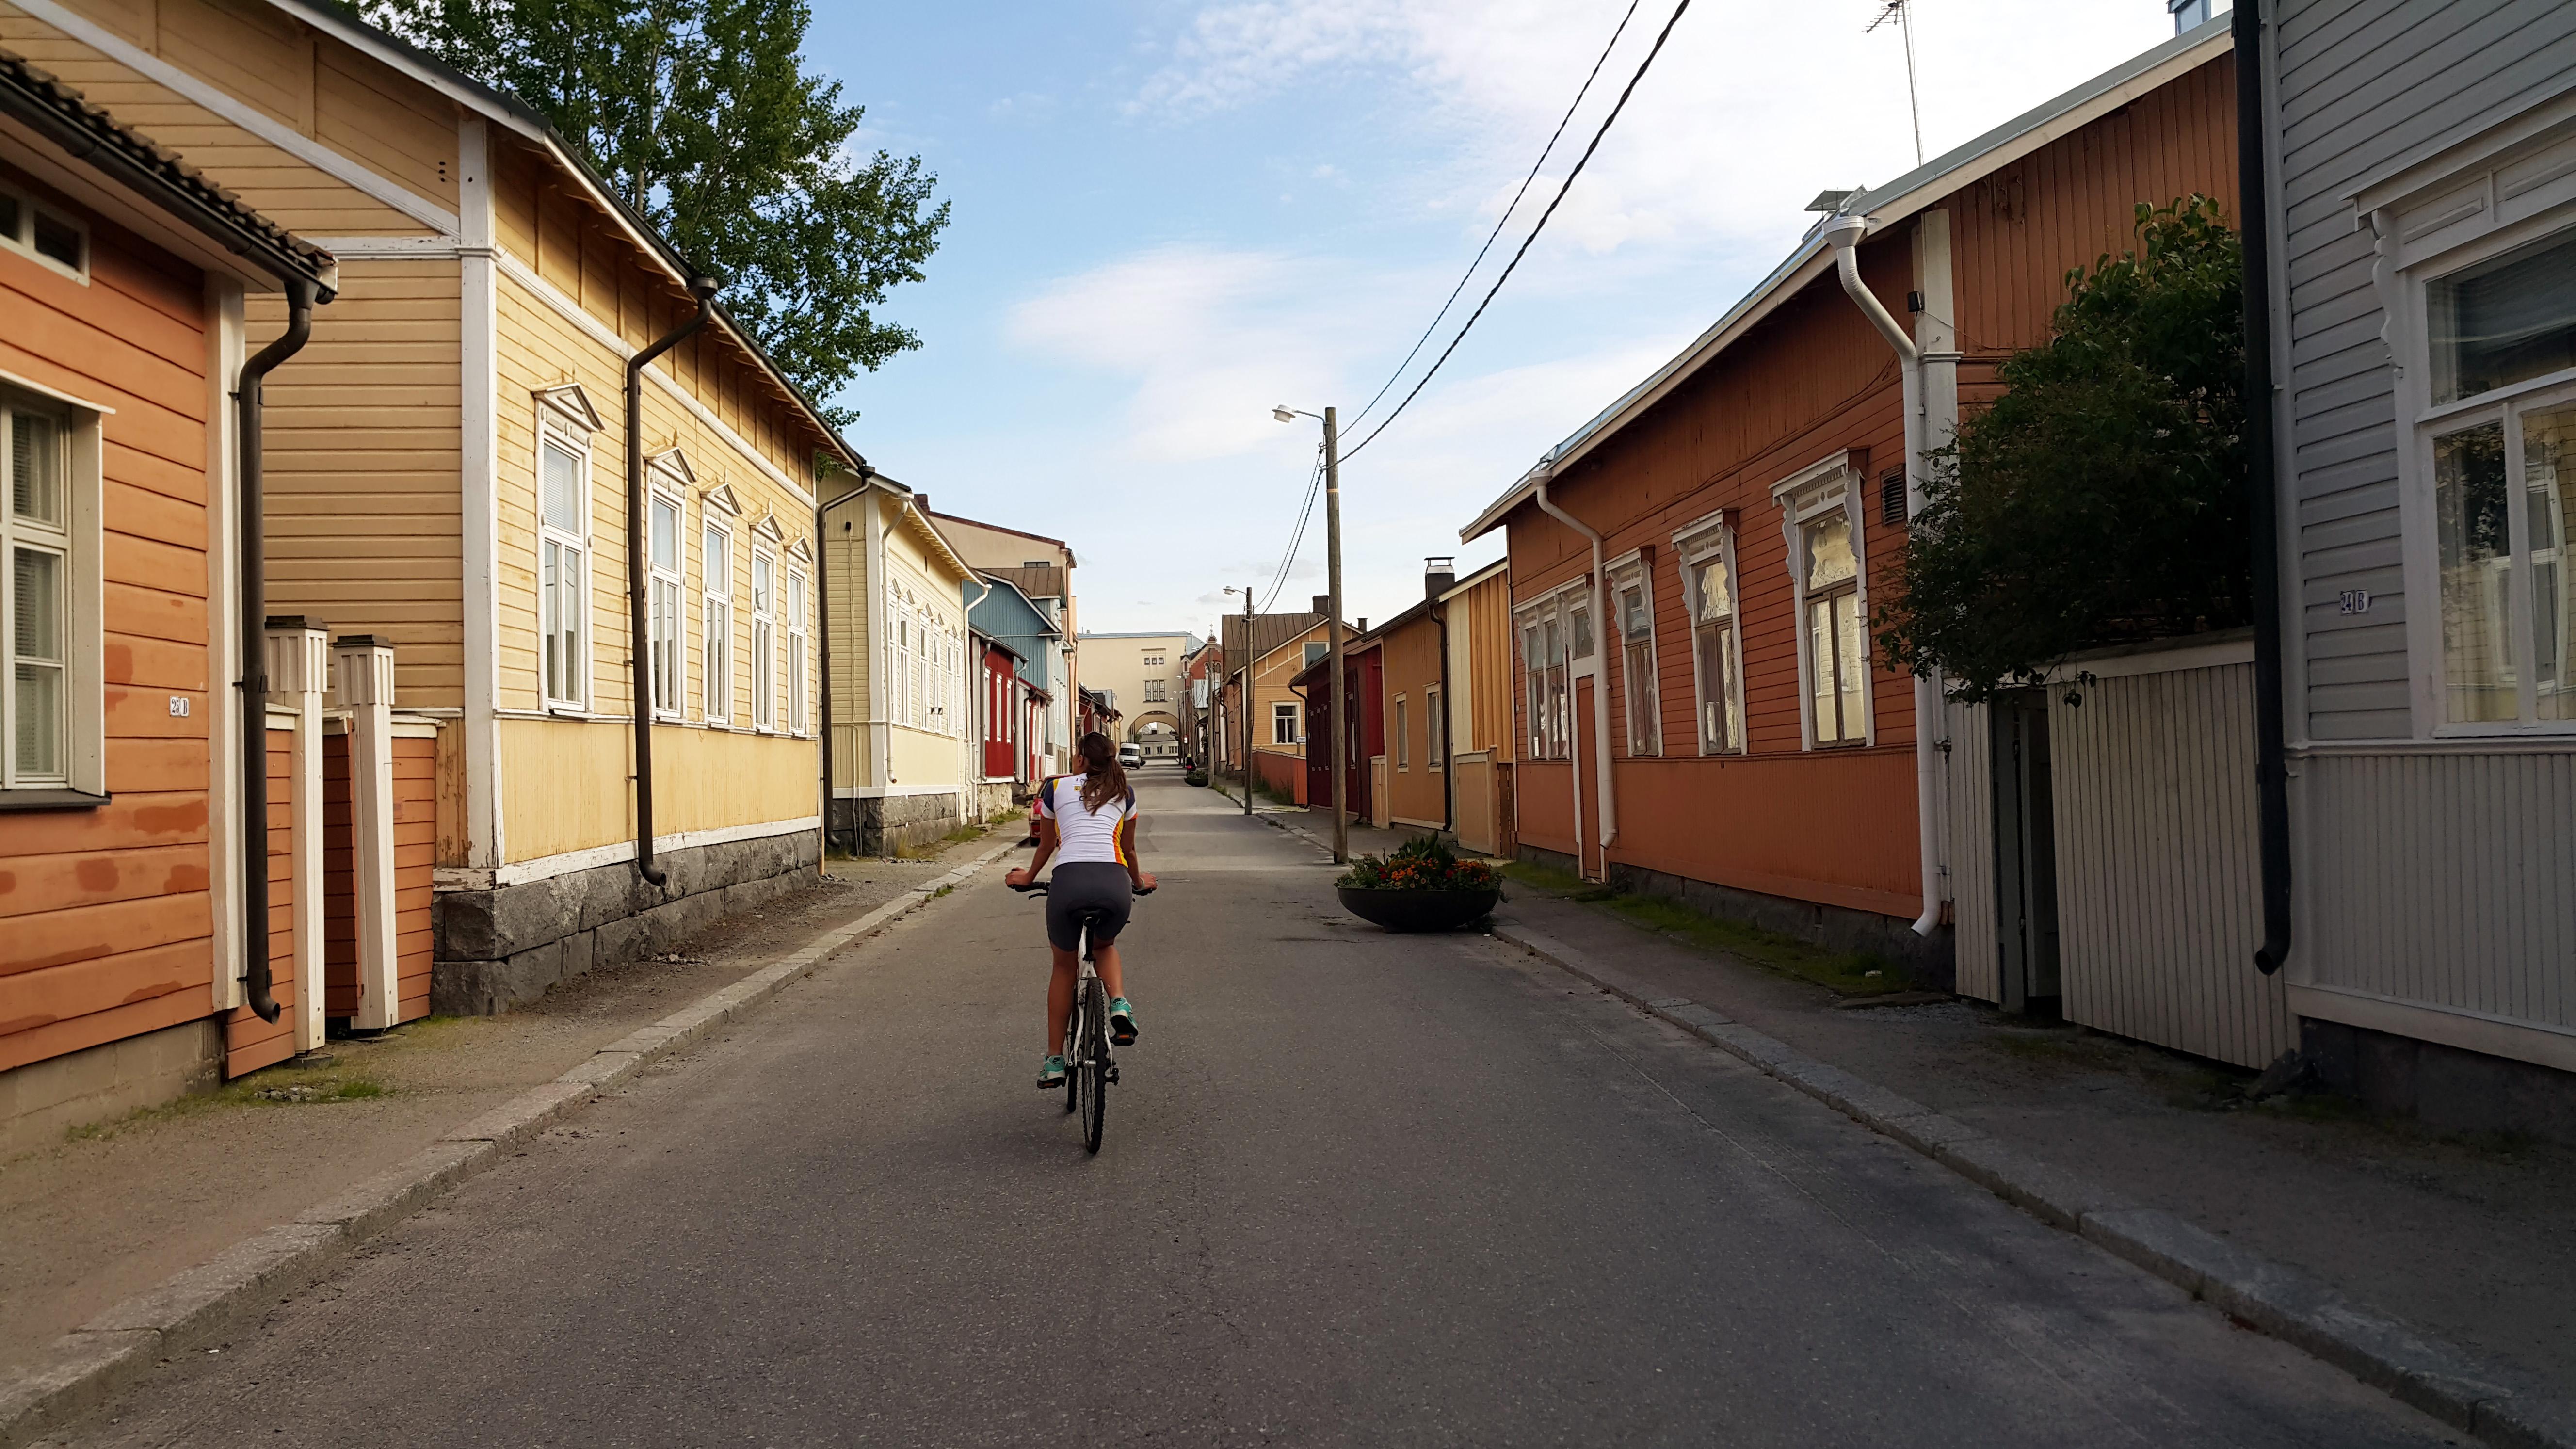 Jakobstadt 1, Finlandia